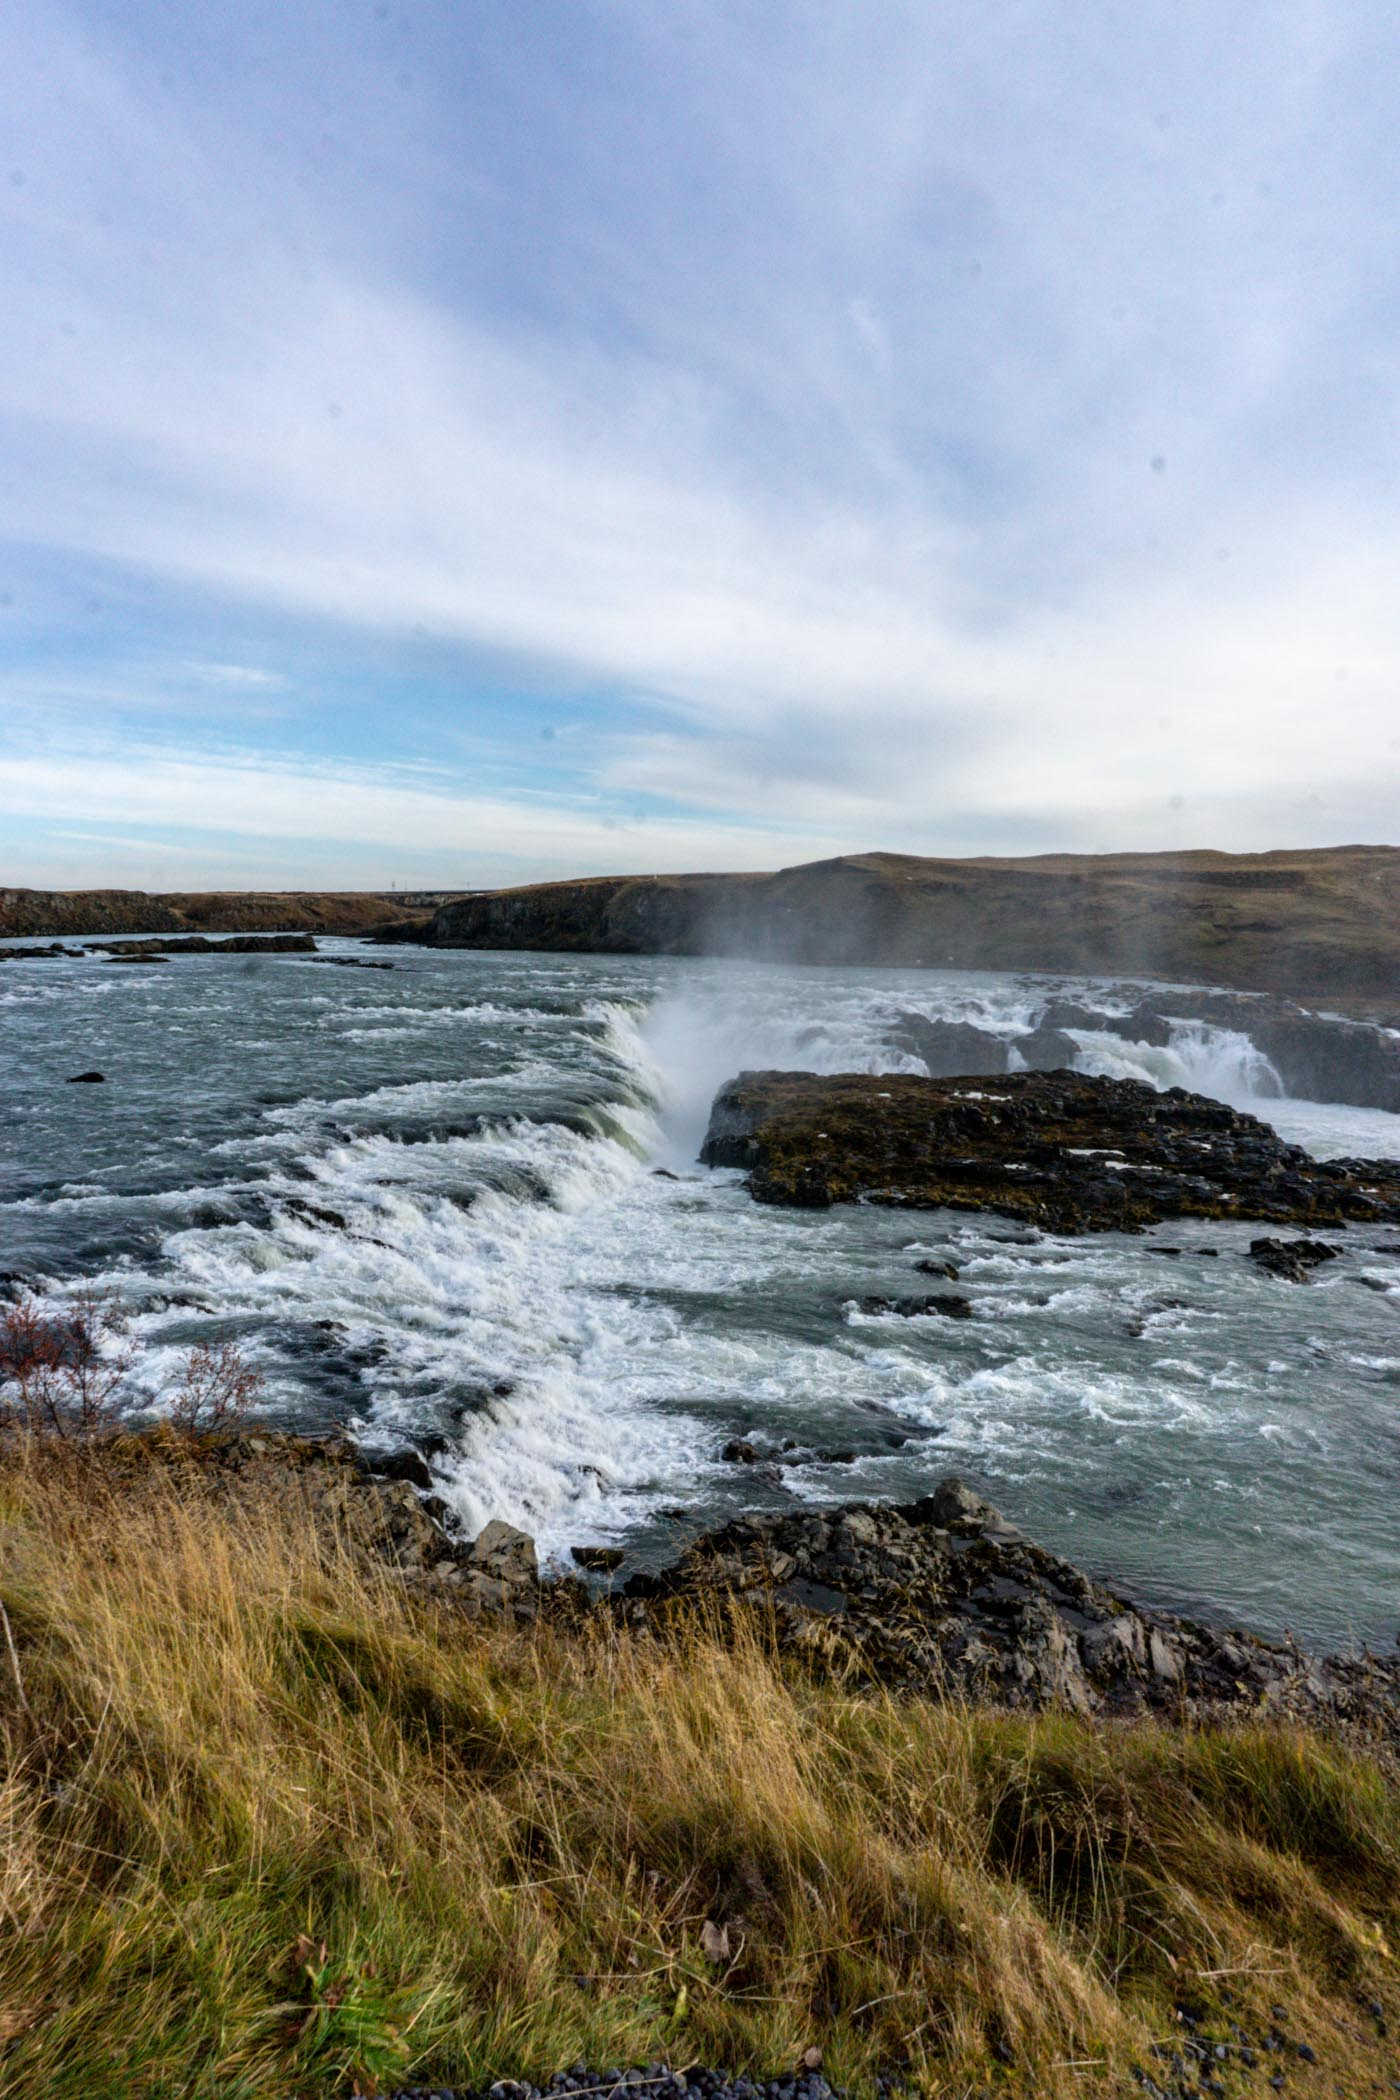 Urriofoss waterfall in Iceland